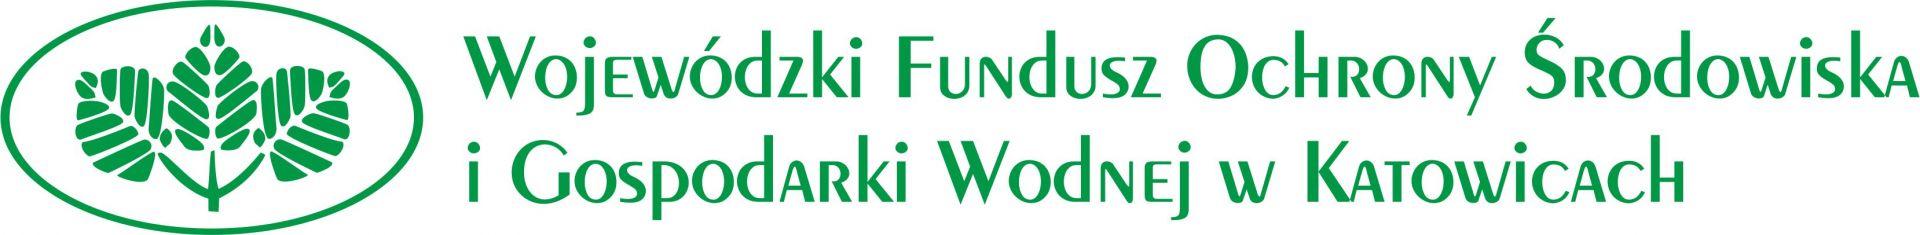 Logo WFOiŚ